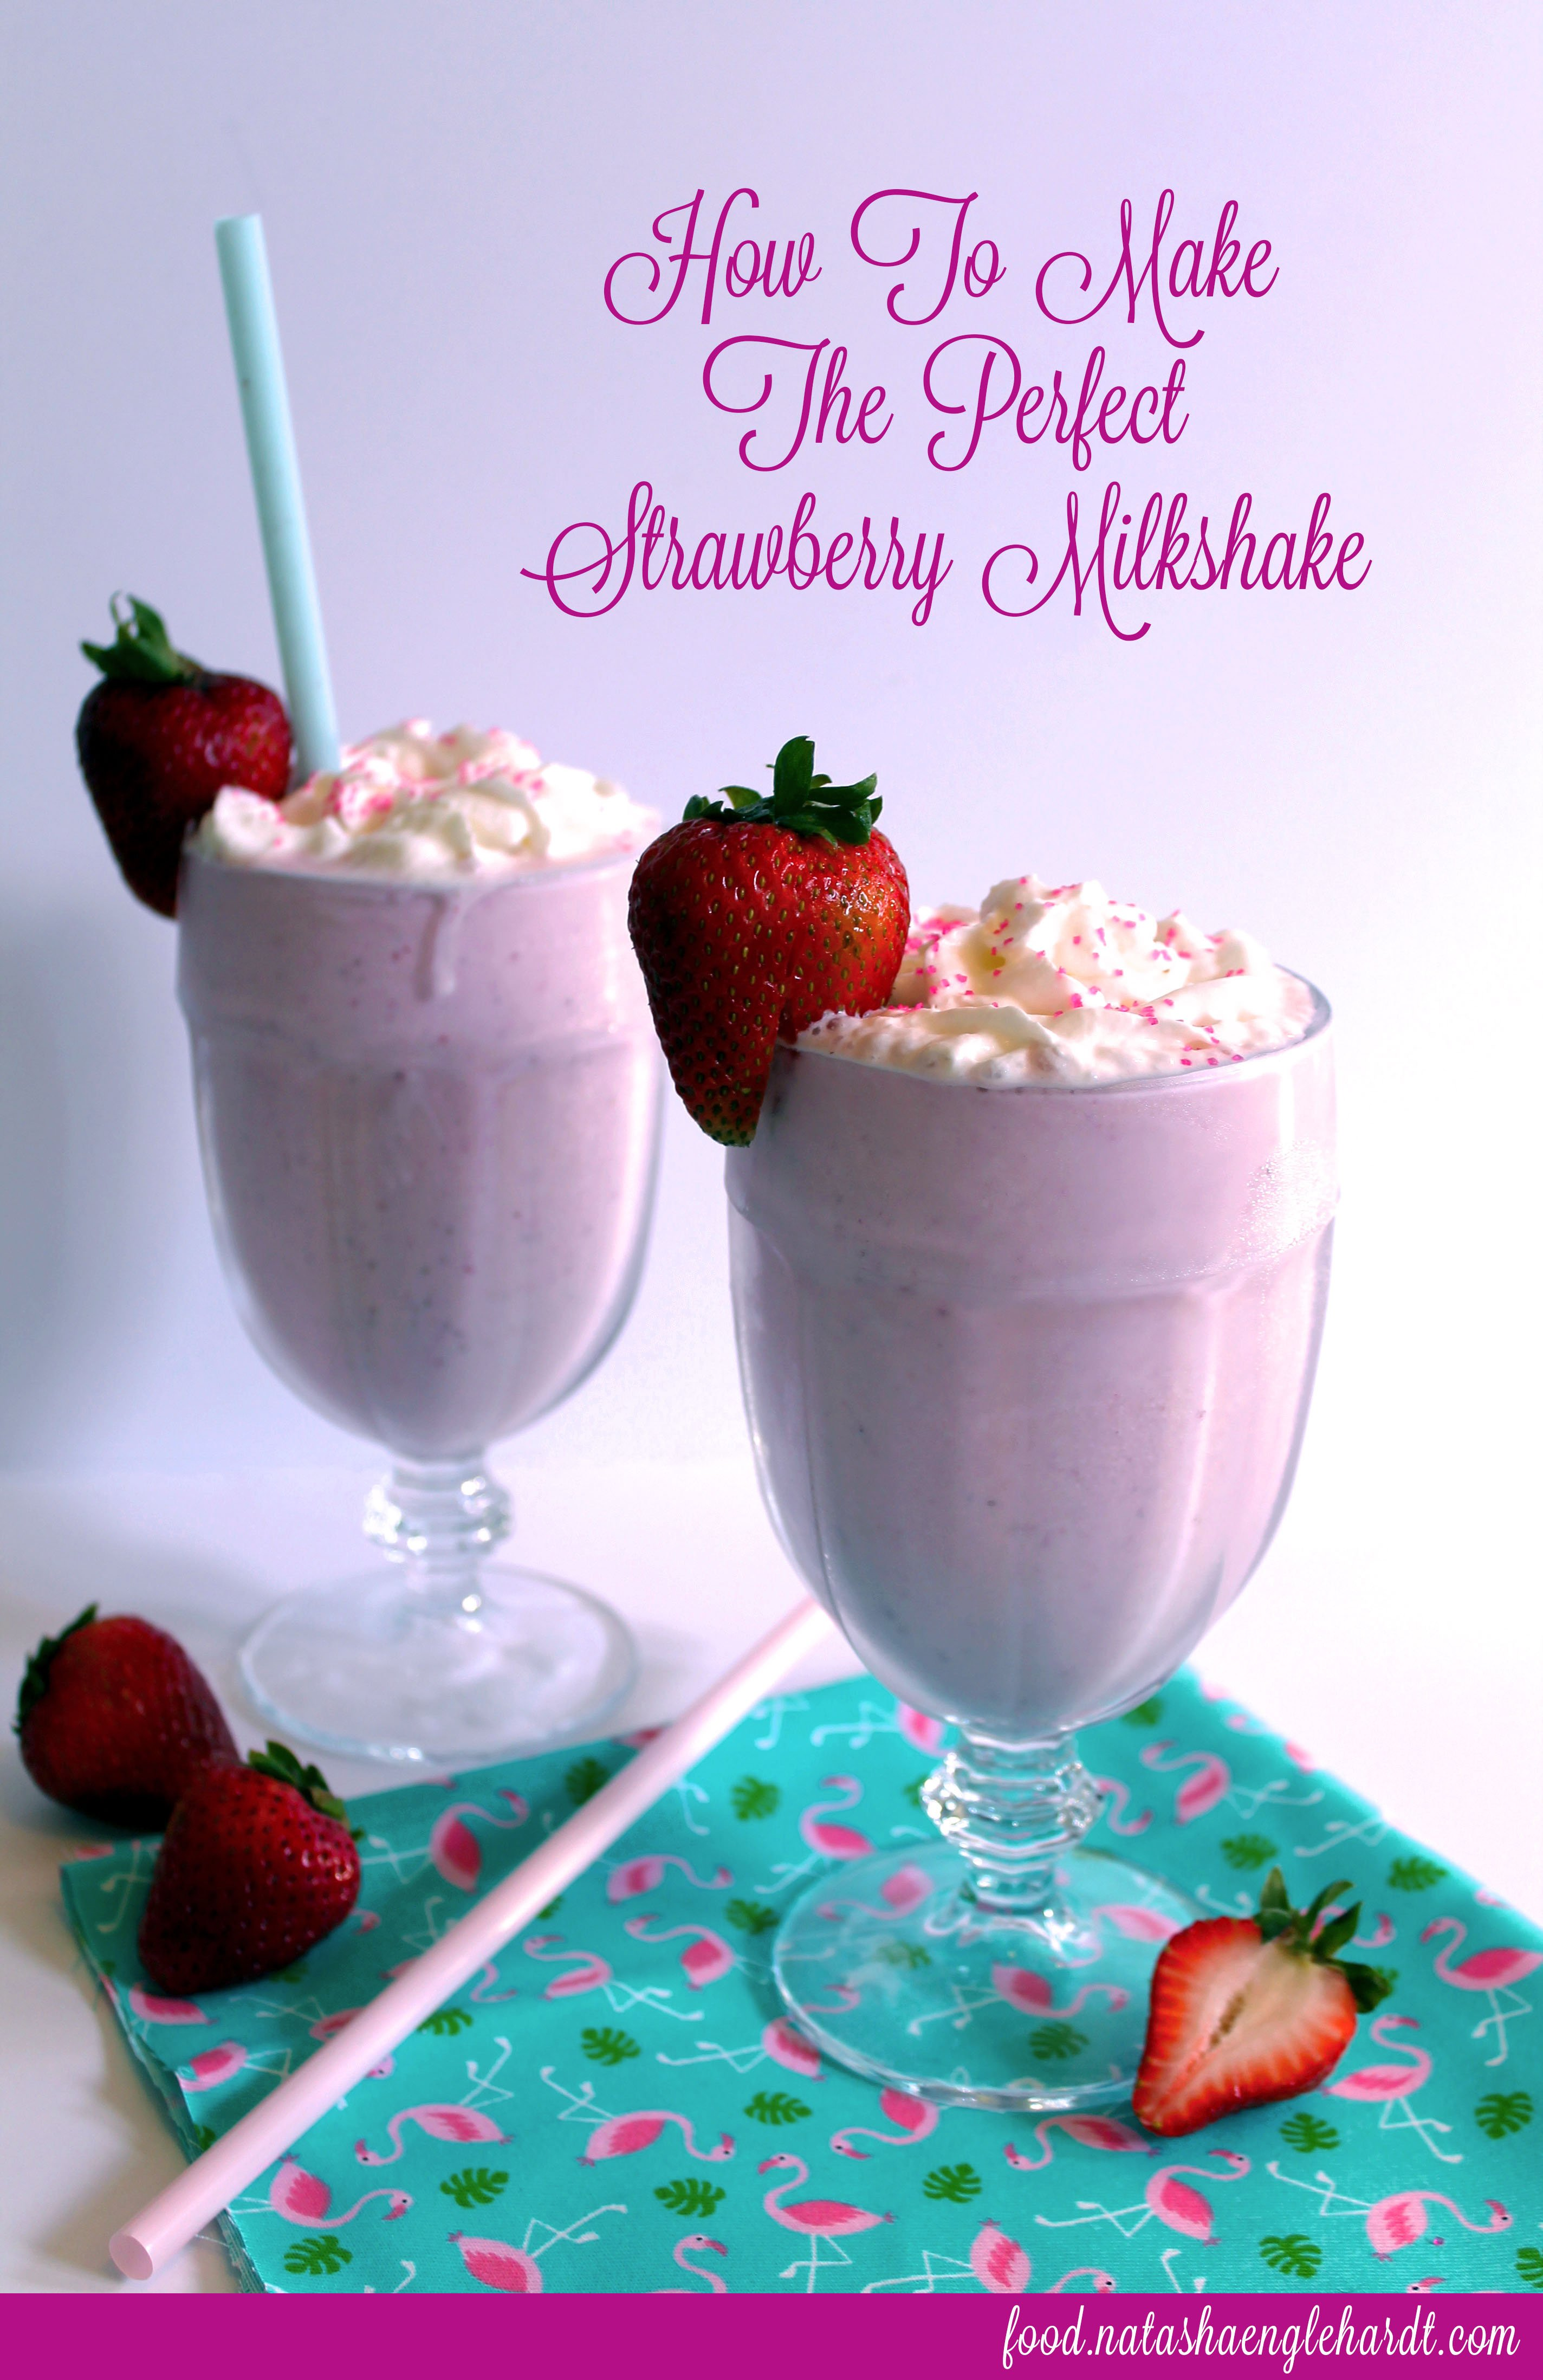 How To Make The Perfect Strawberry Milkshake